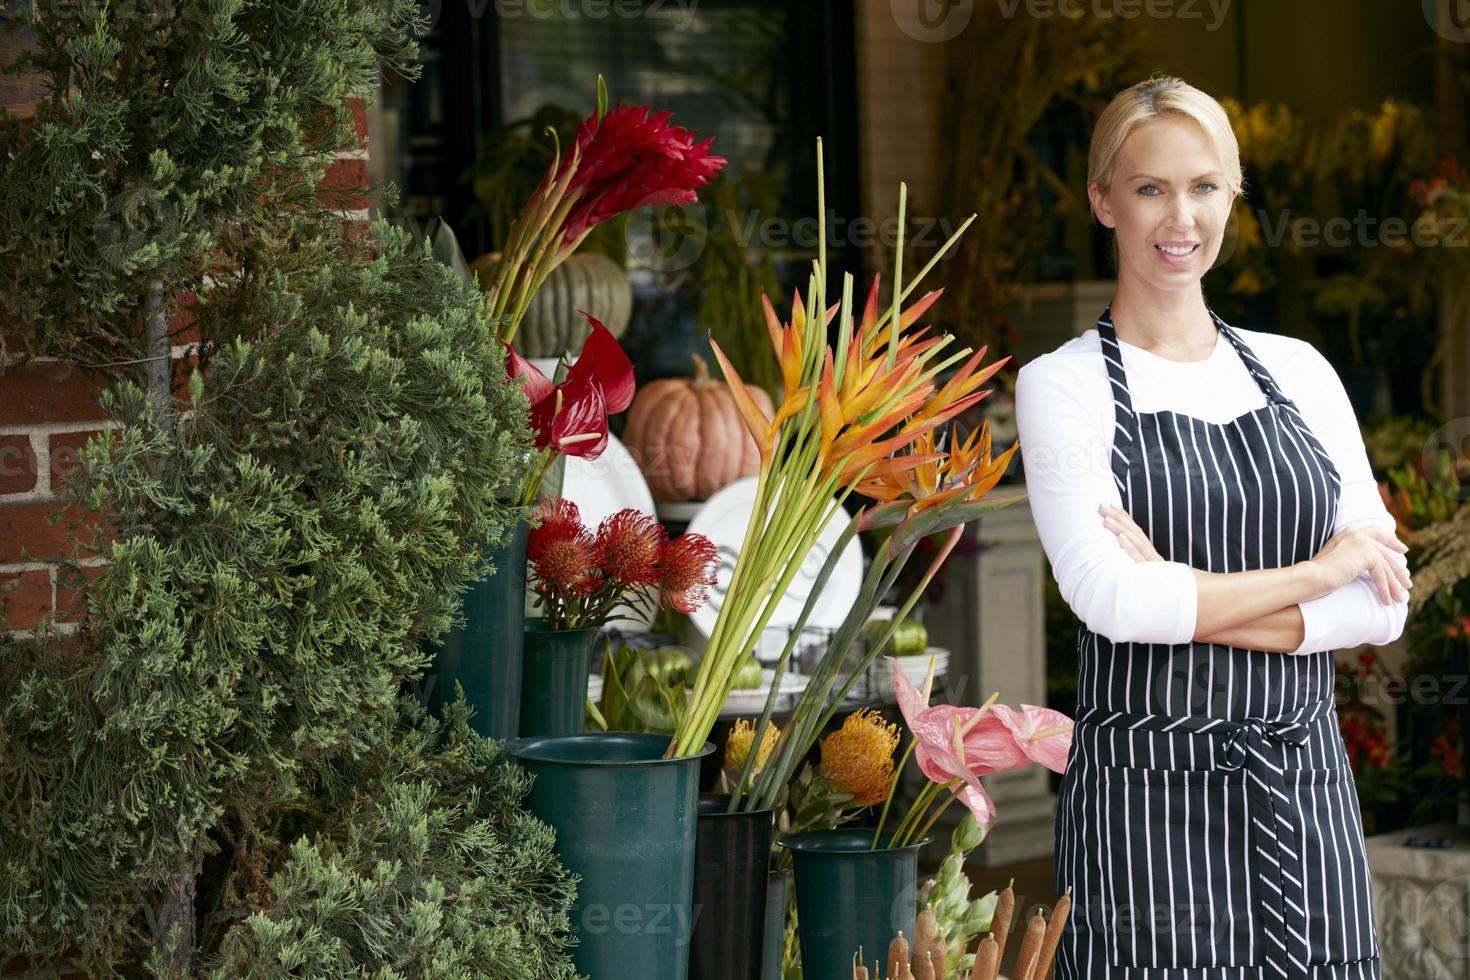 retrato de florista feminina fora da loja foto